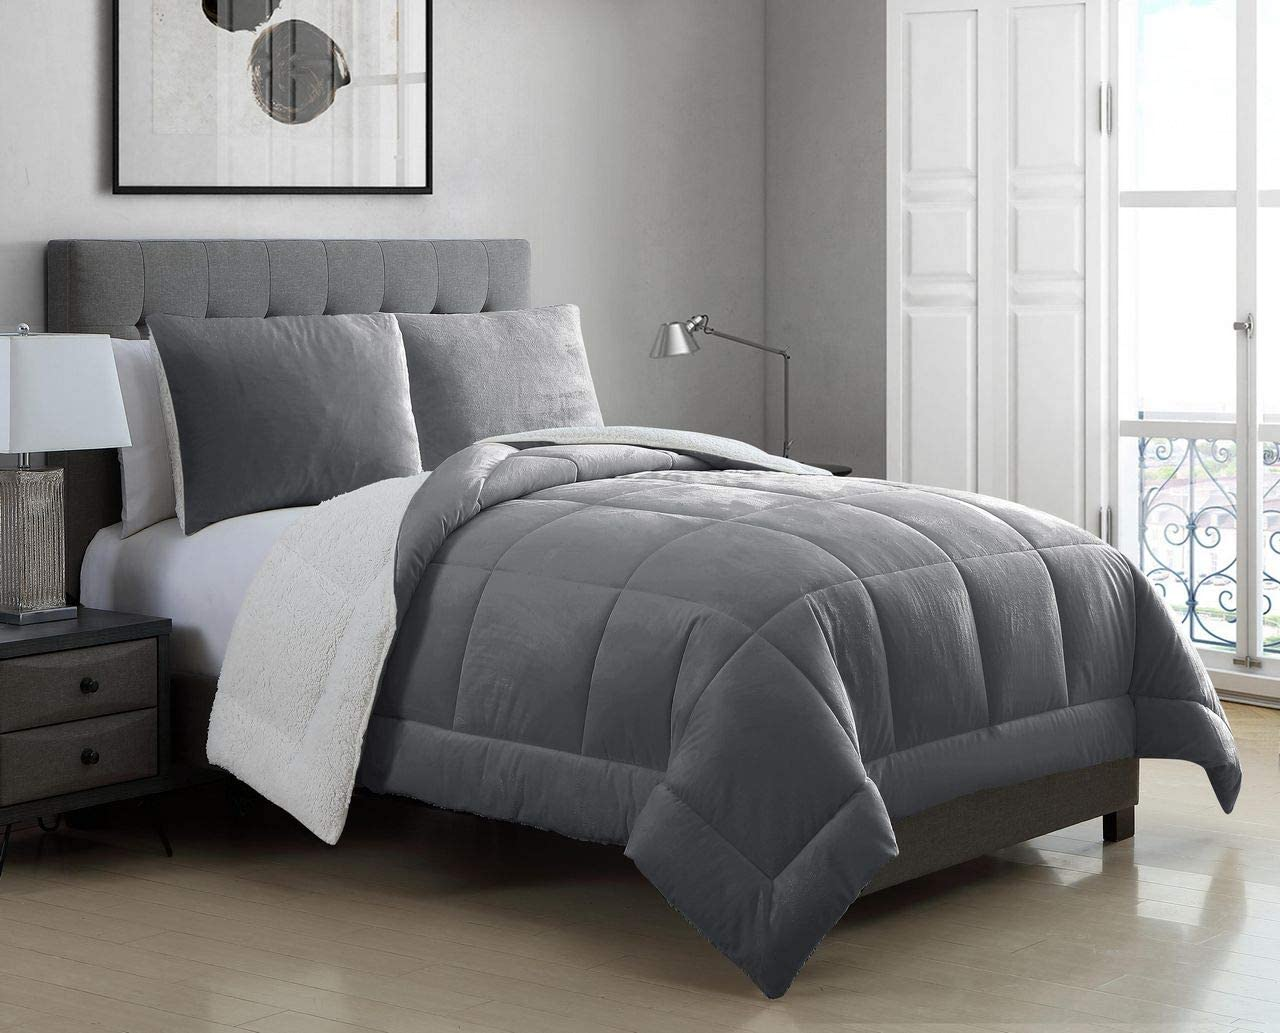 KingLinen 2 Piece Micromink Sherpa Silky Smooth Plush Oversized Gray Comforter Set Twin/Twin XL